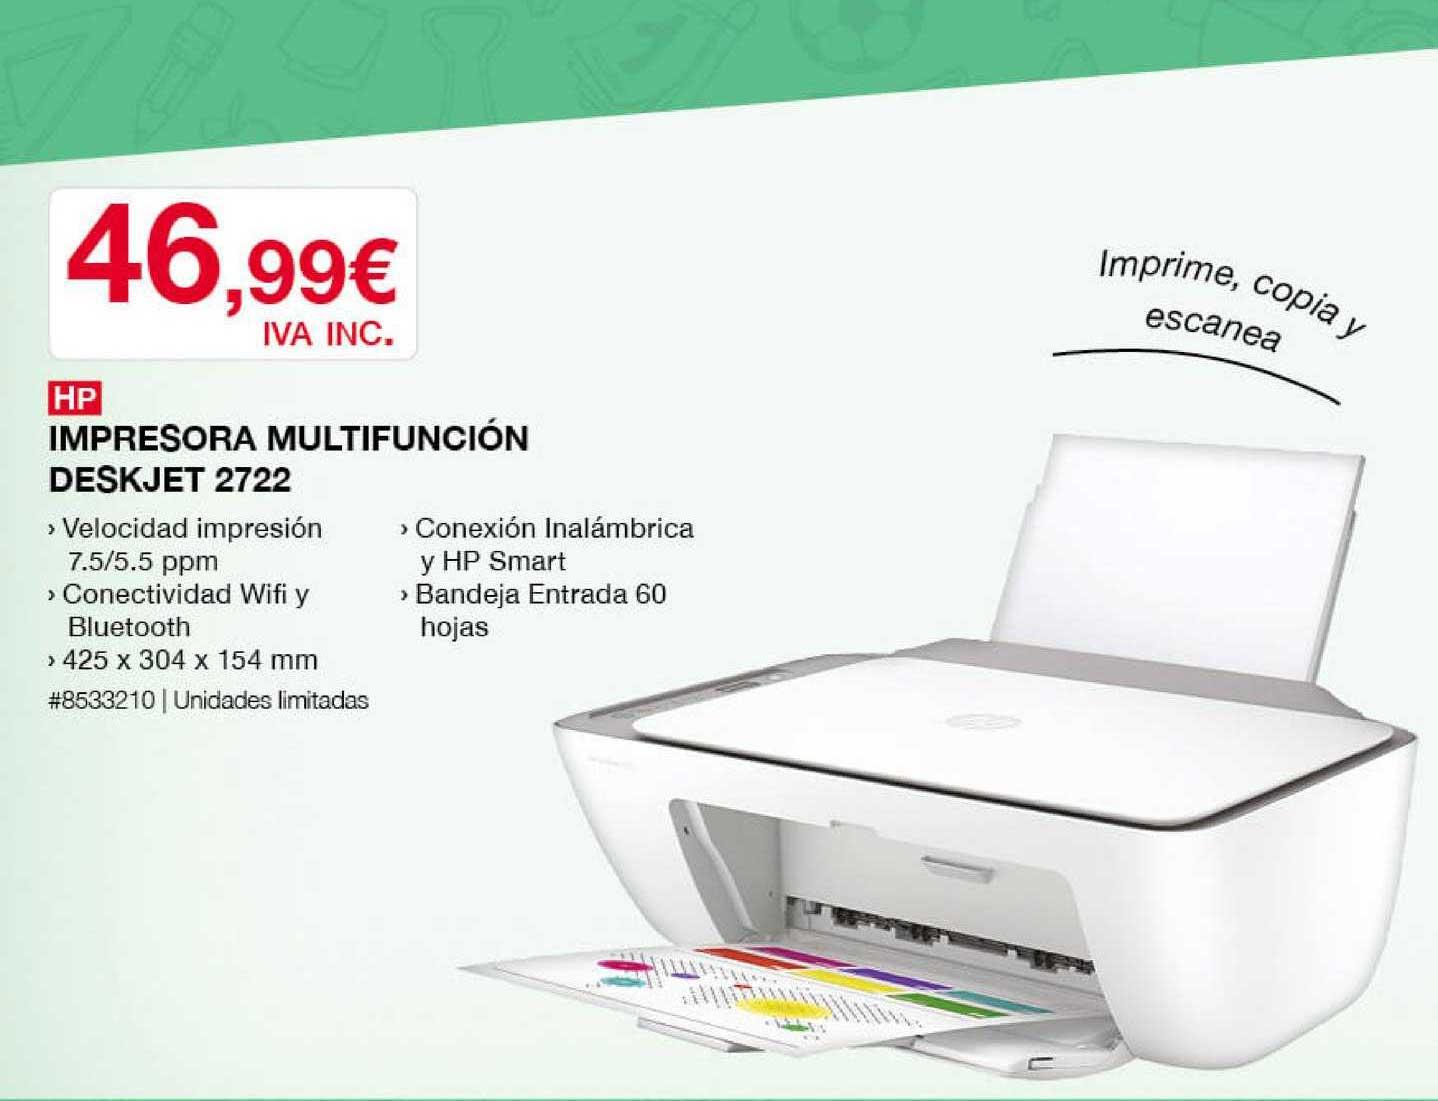 Costco HP Impresora Multifunción Deskjet 2722